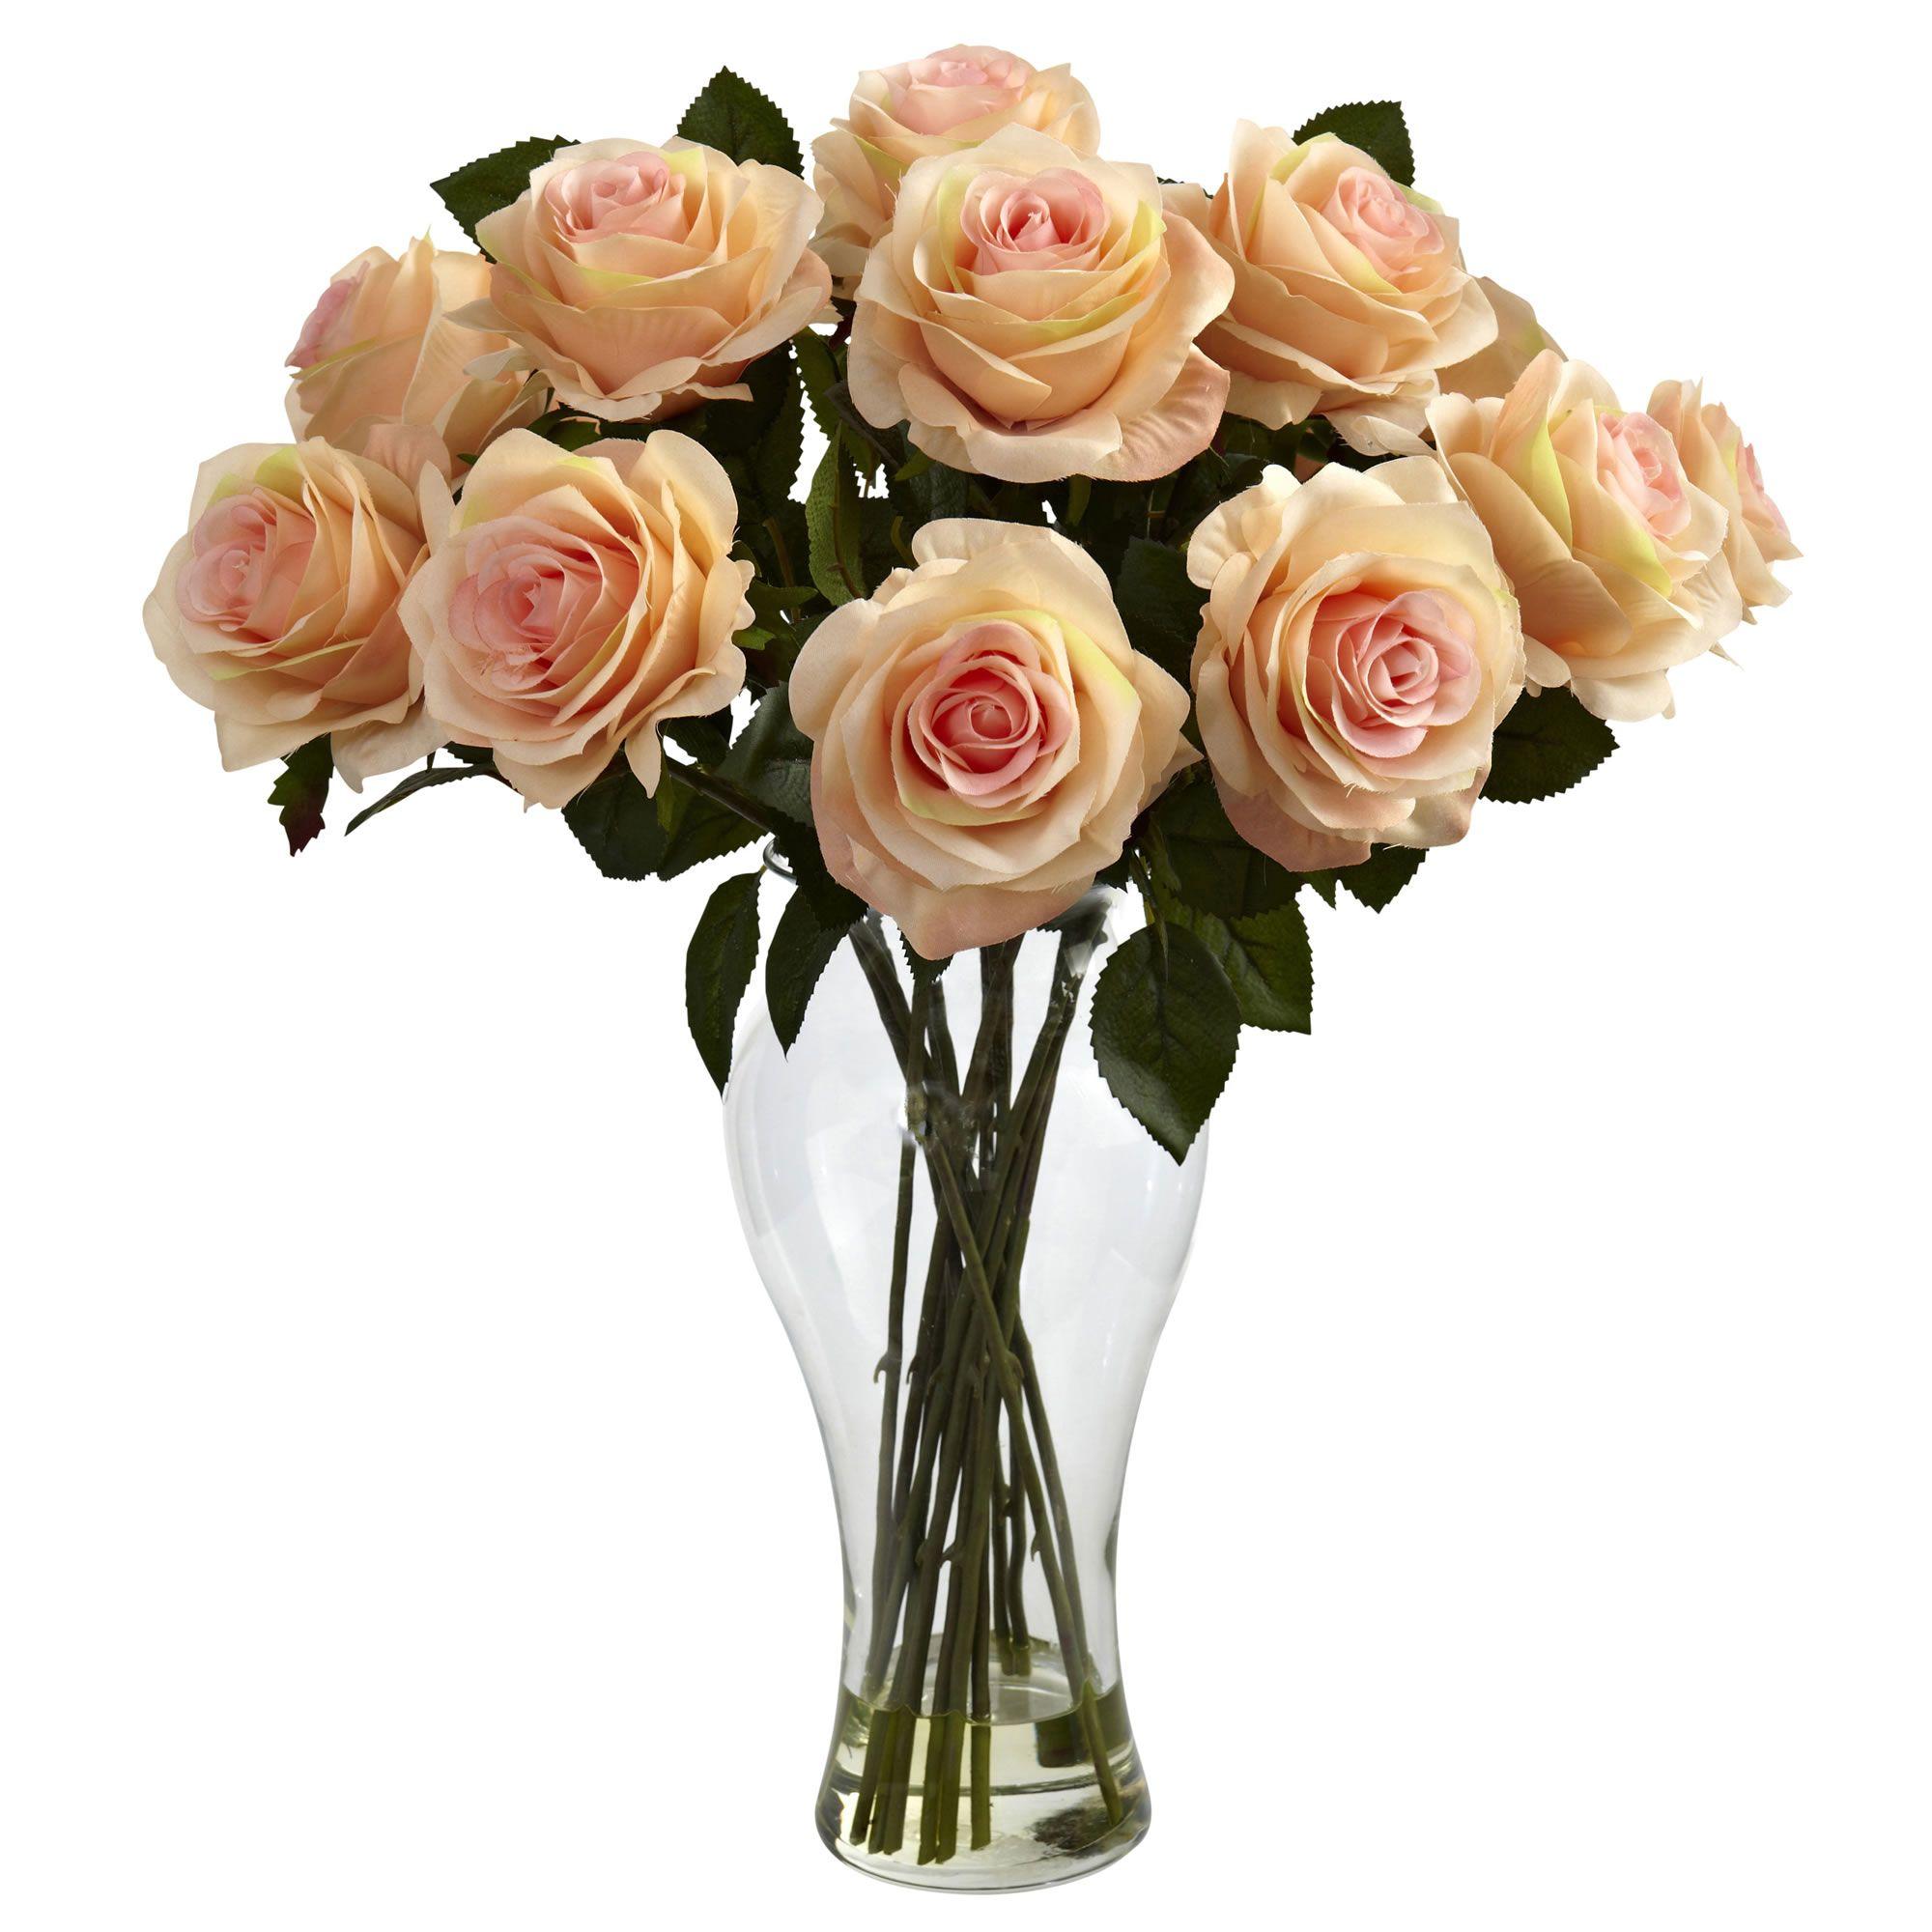 David Shaw Silverware Na Ltd Blooming Roses With Vase Peach Orange